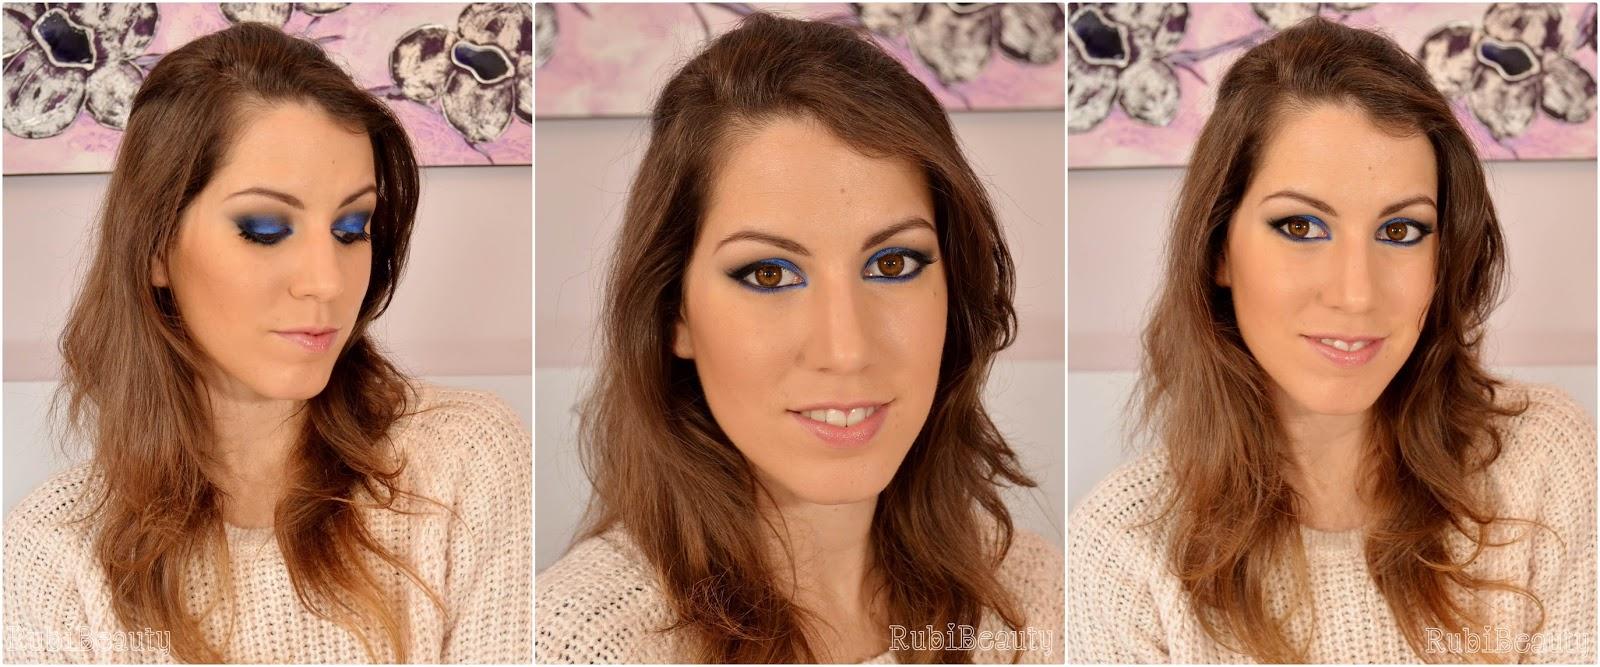 rubibeauty maquillaje fiesta navidad christmas makeup xmas 2014 azul blue pigmentos